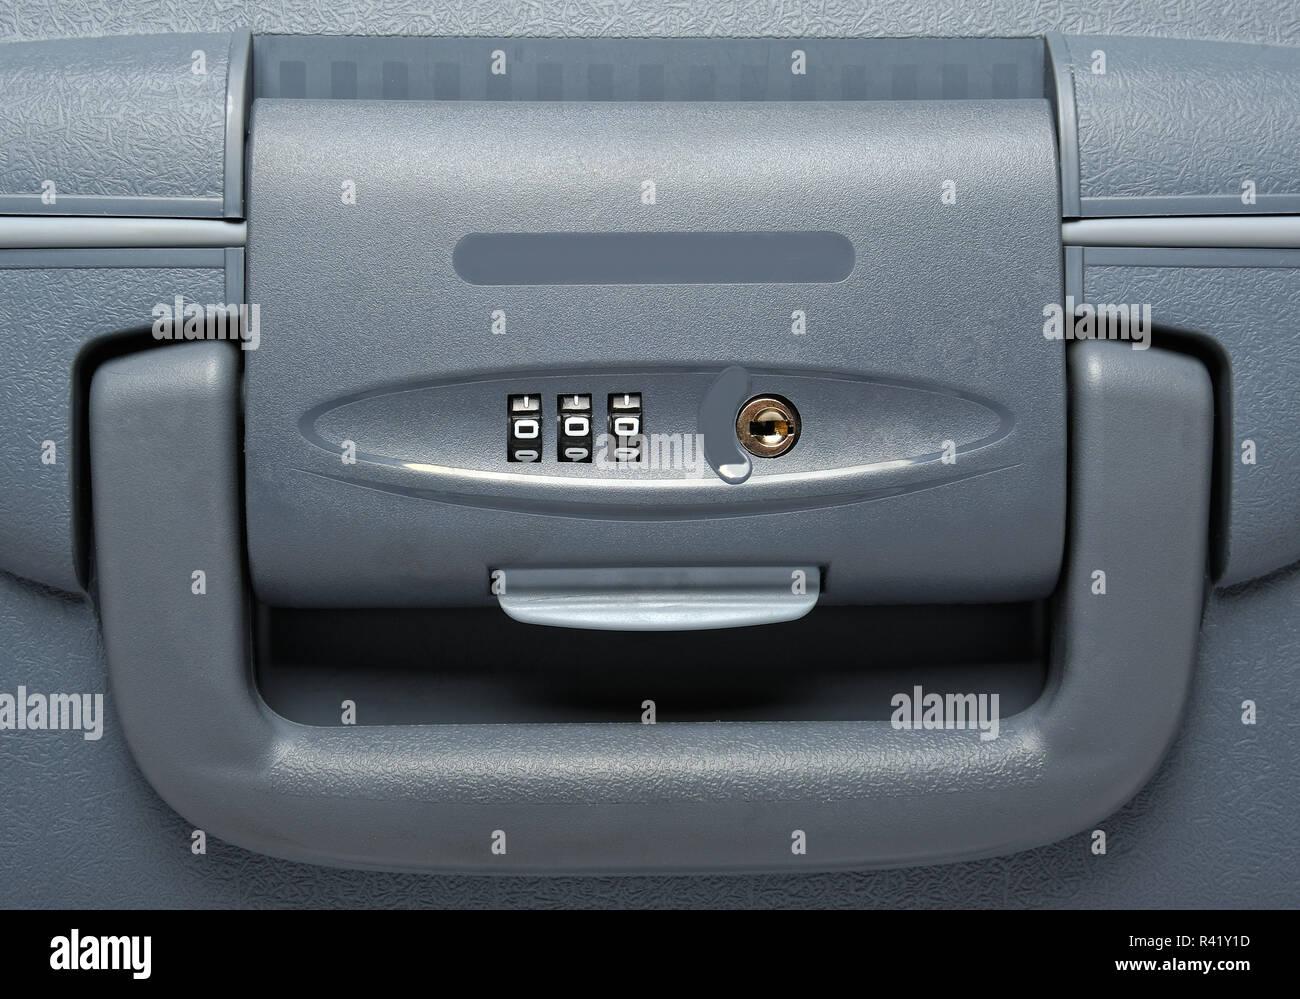 Combination lock on suitcase - Stock Image